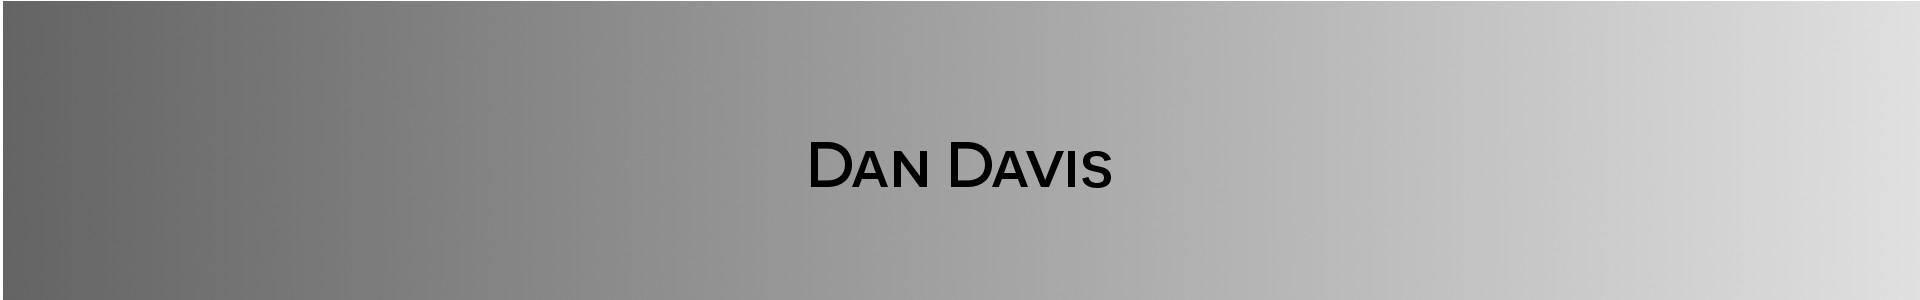 Daniel Davis banner image